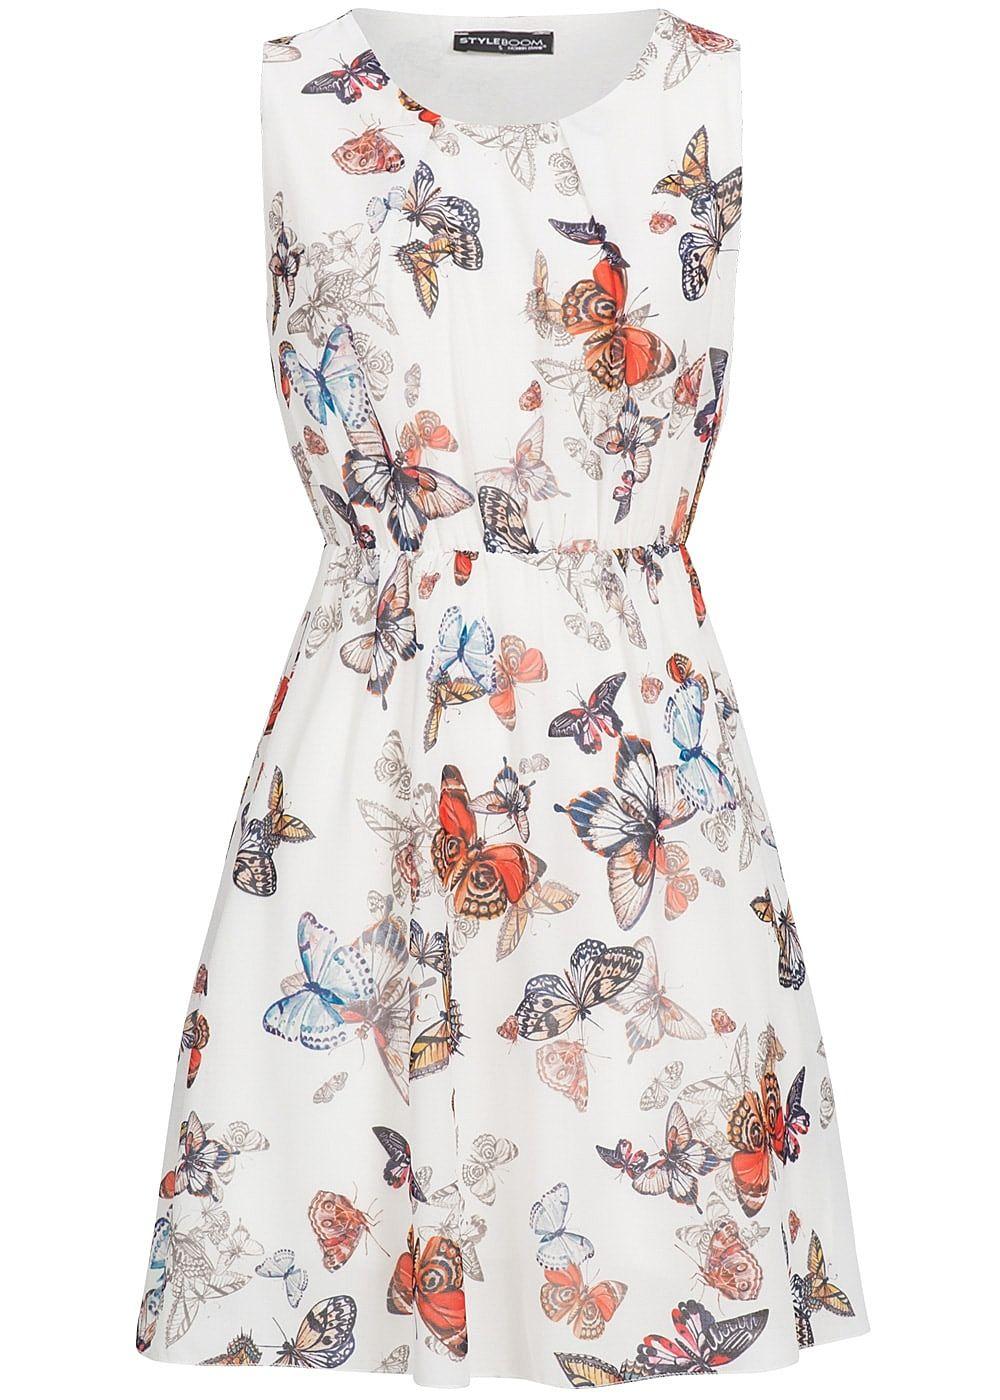 Styleboom Fashion Damen Mini Kleid Gummizug Schmetterling Muster